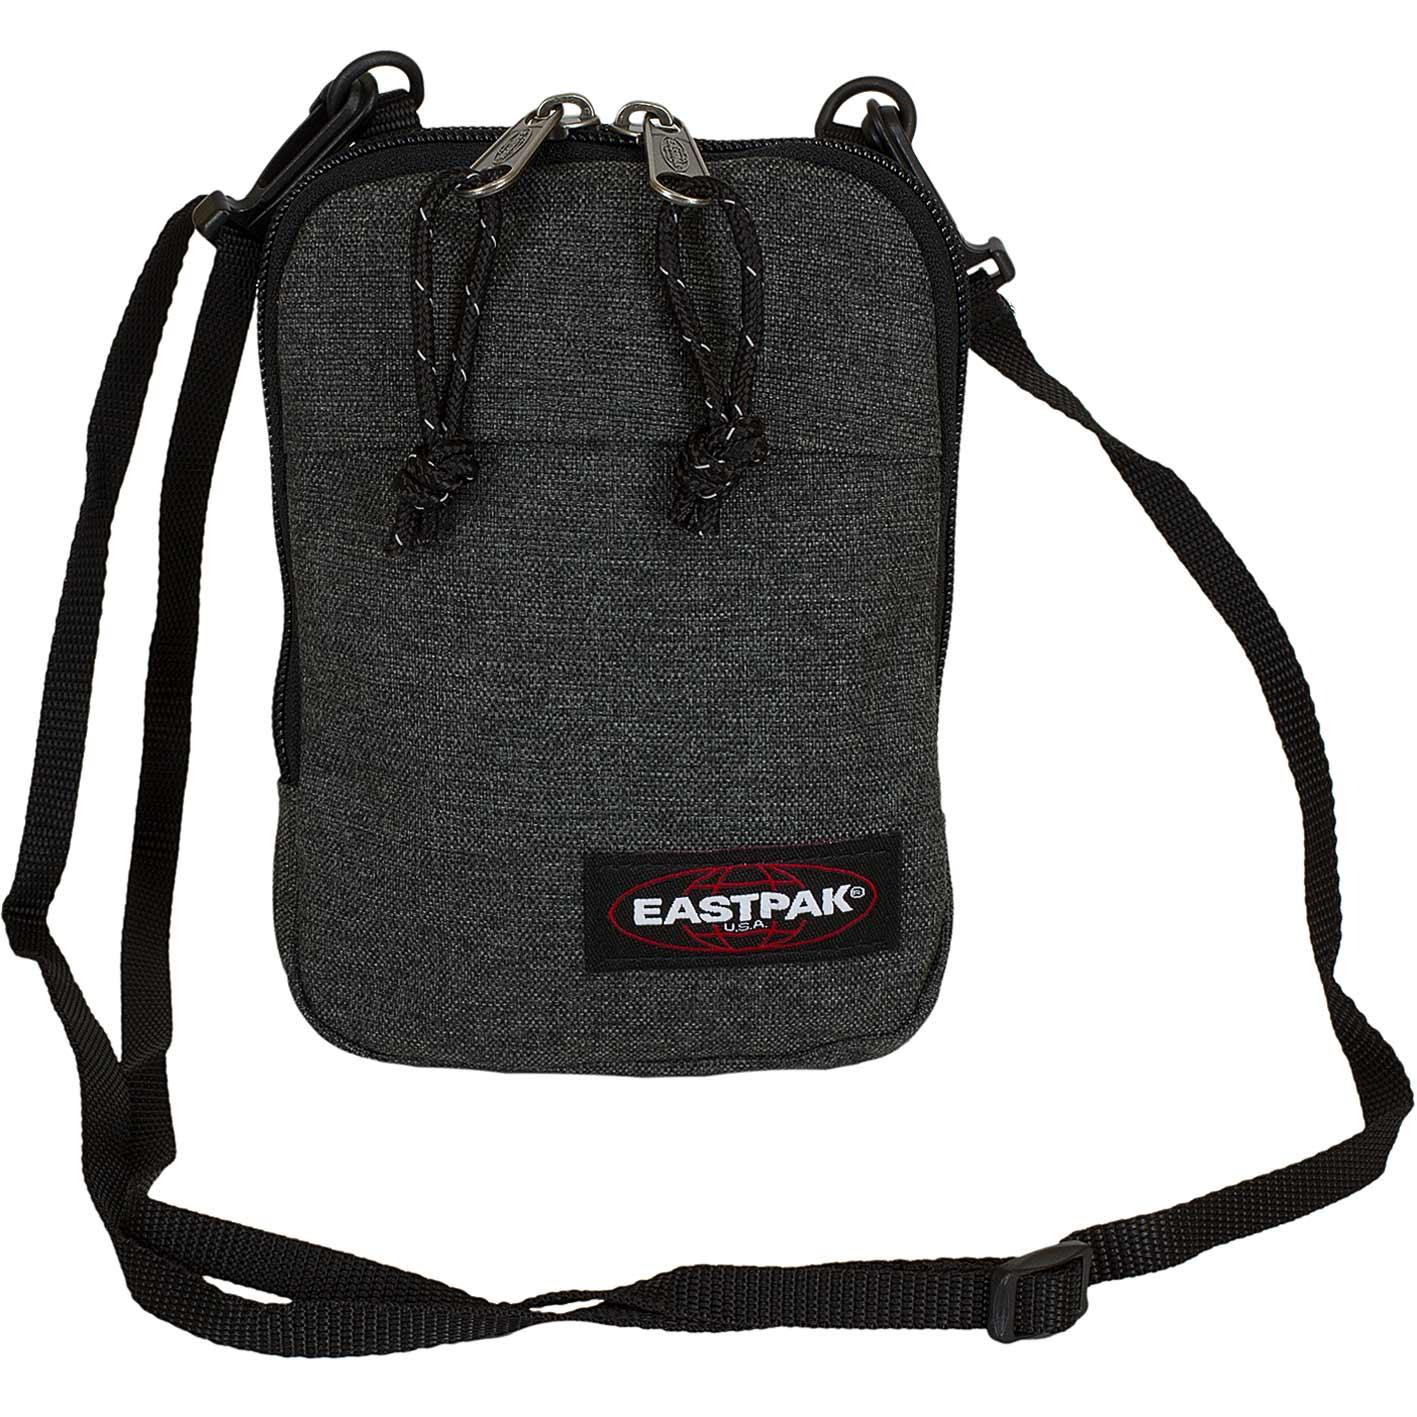 97cd96cb2027f ☆ Eastpak Mini Tasche Buddy schwarz denim - hier bestellen!